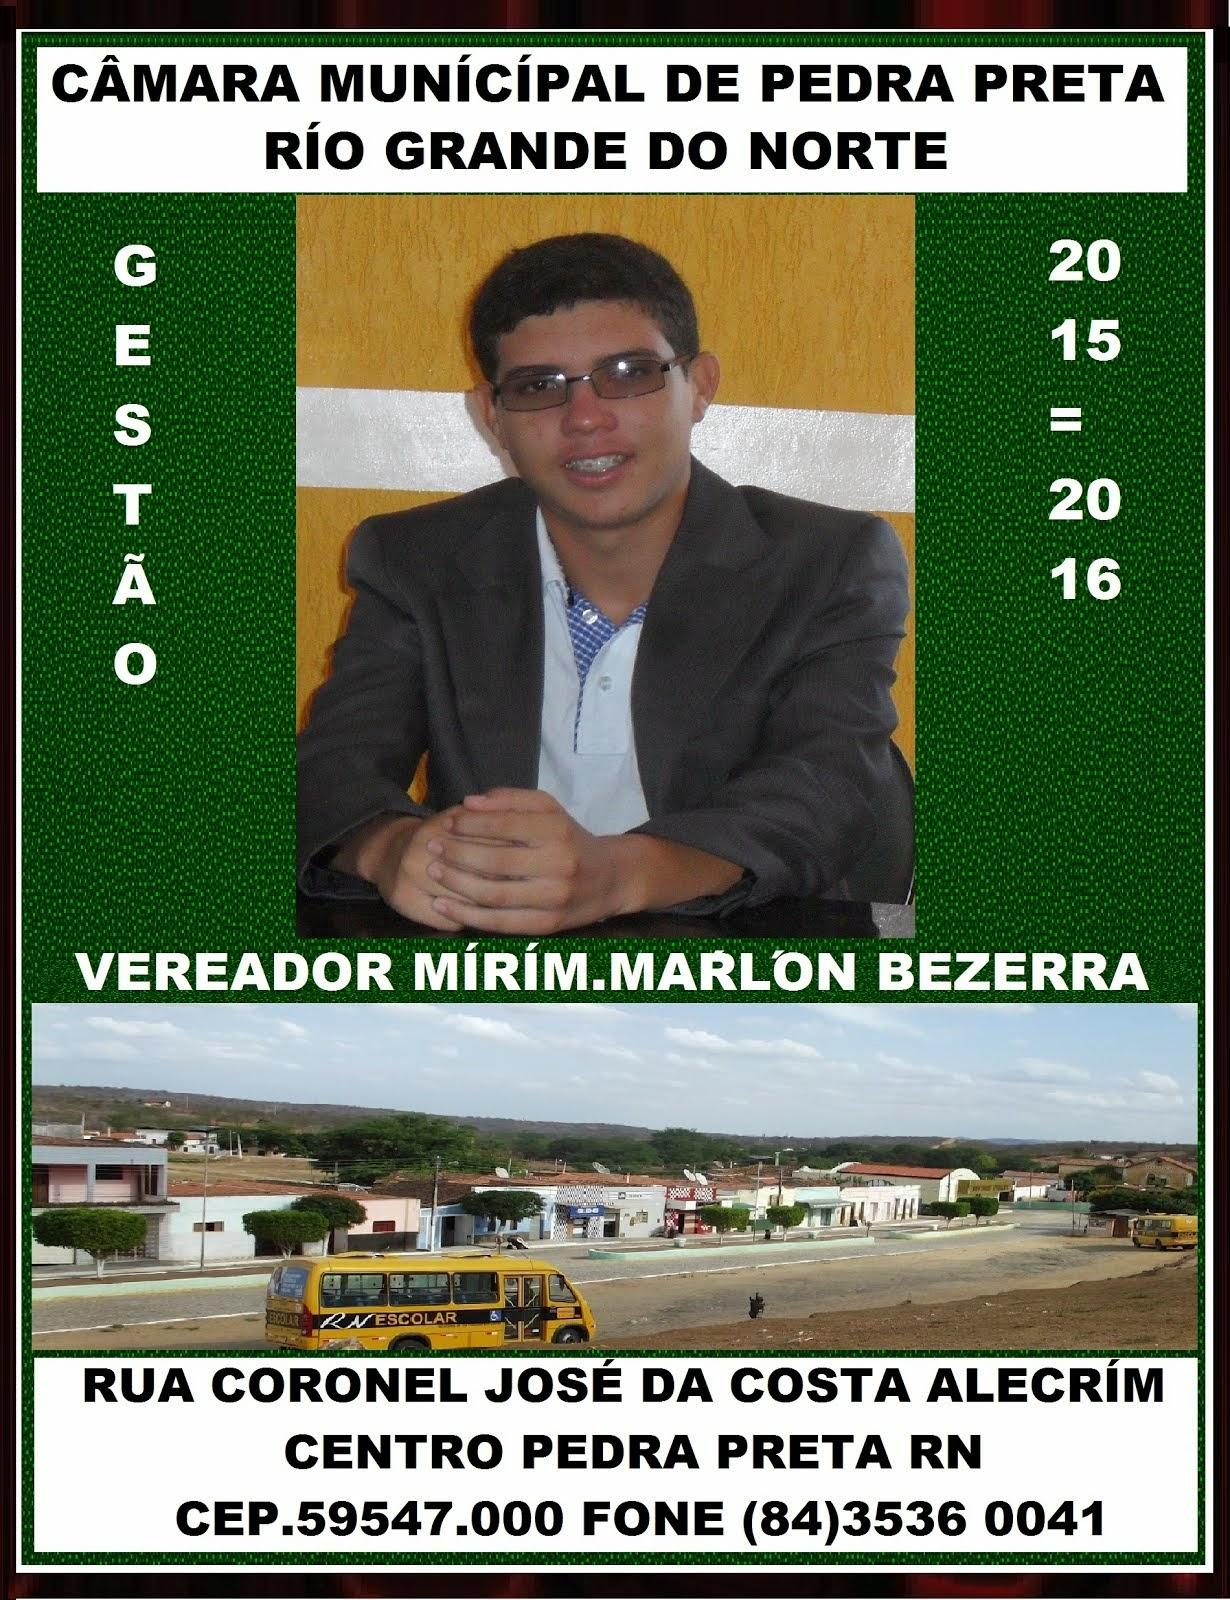 VEREADOR MARLON BEZERRA PEDRA PRETA RN